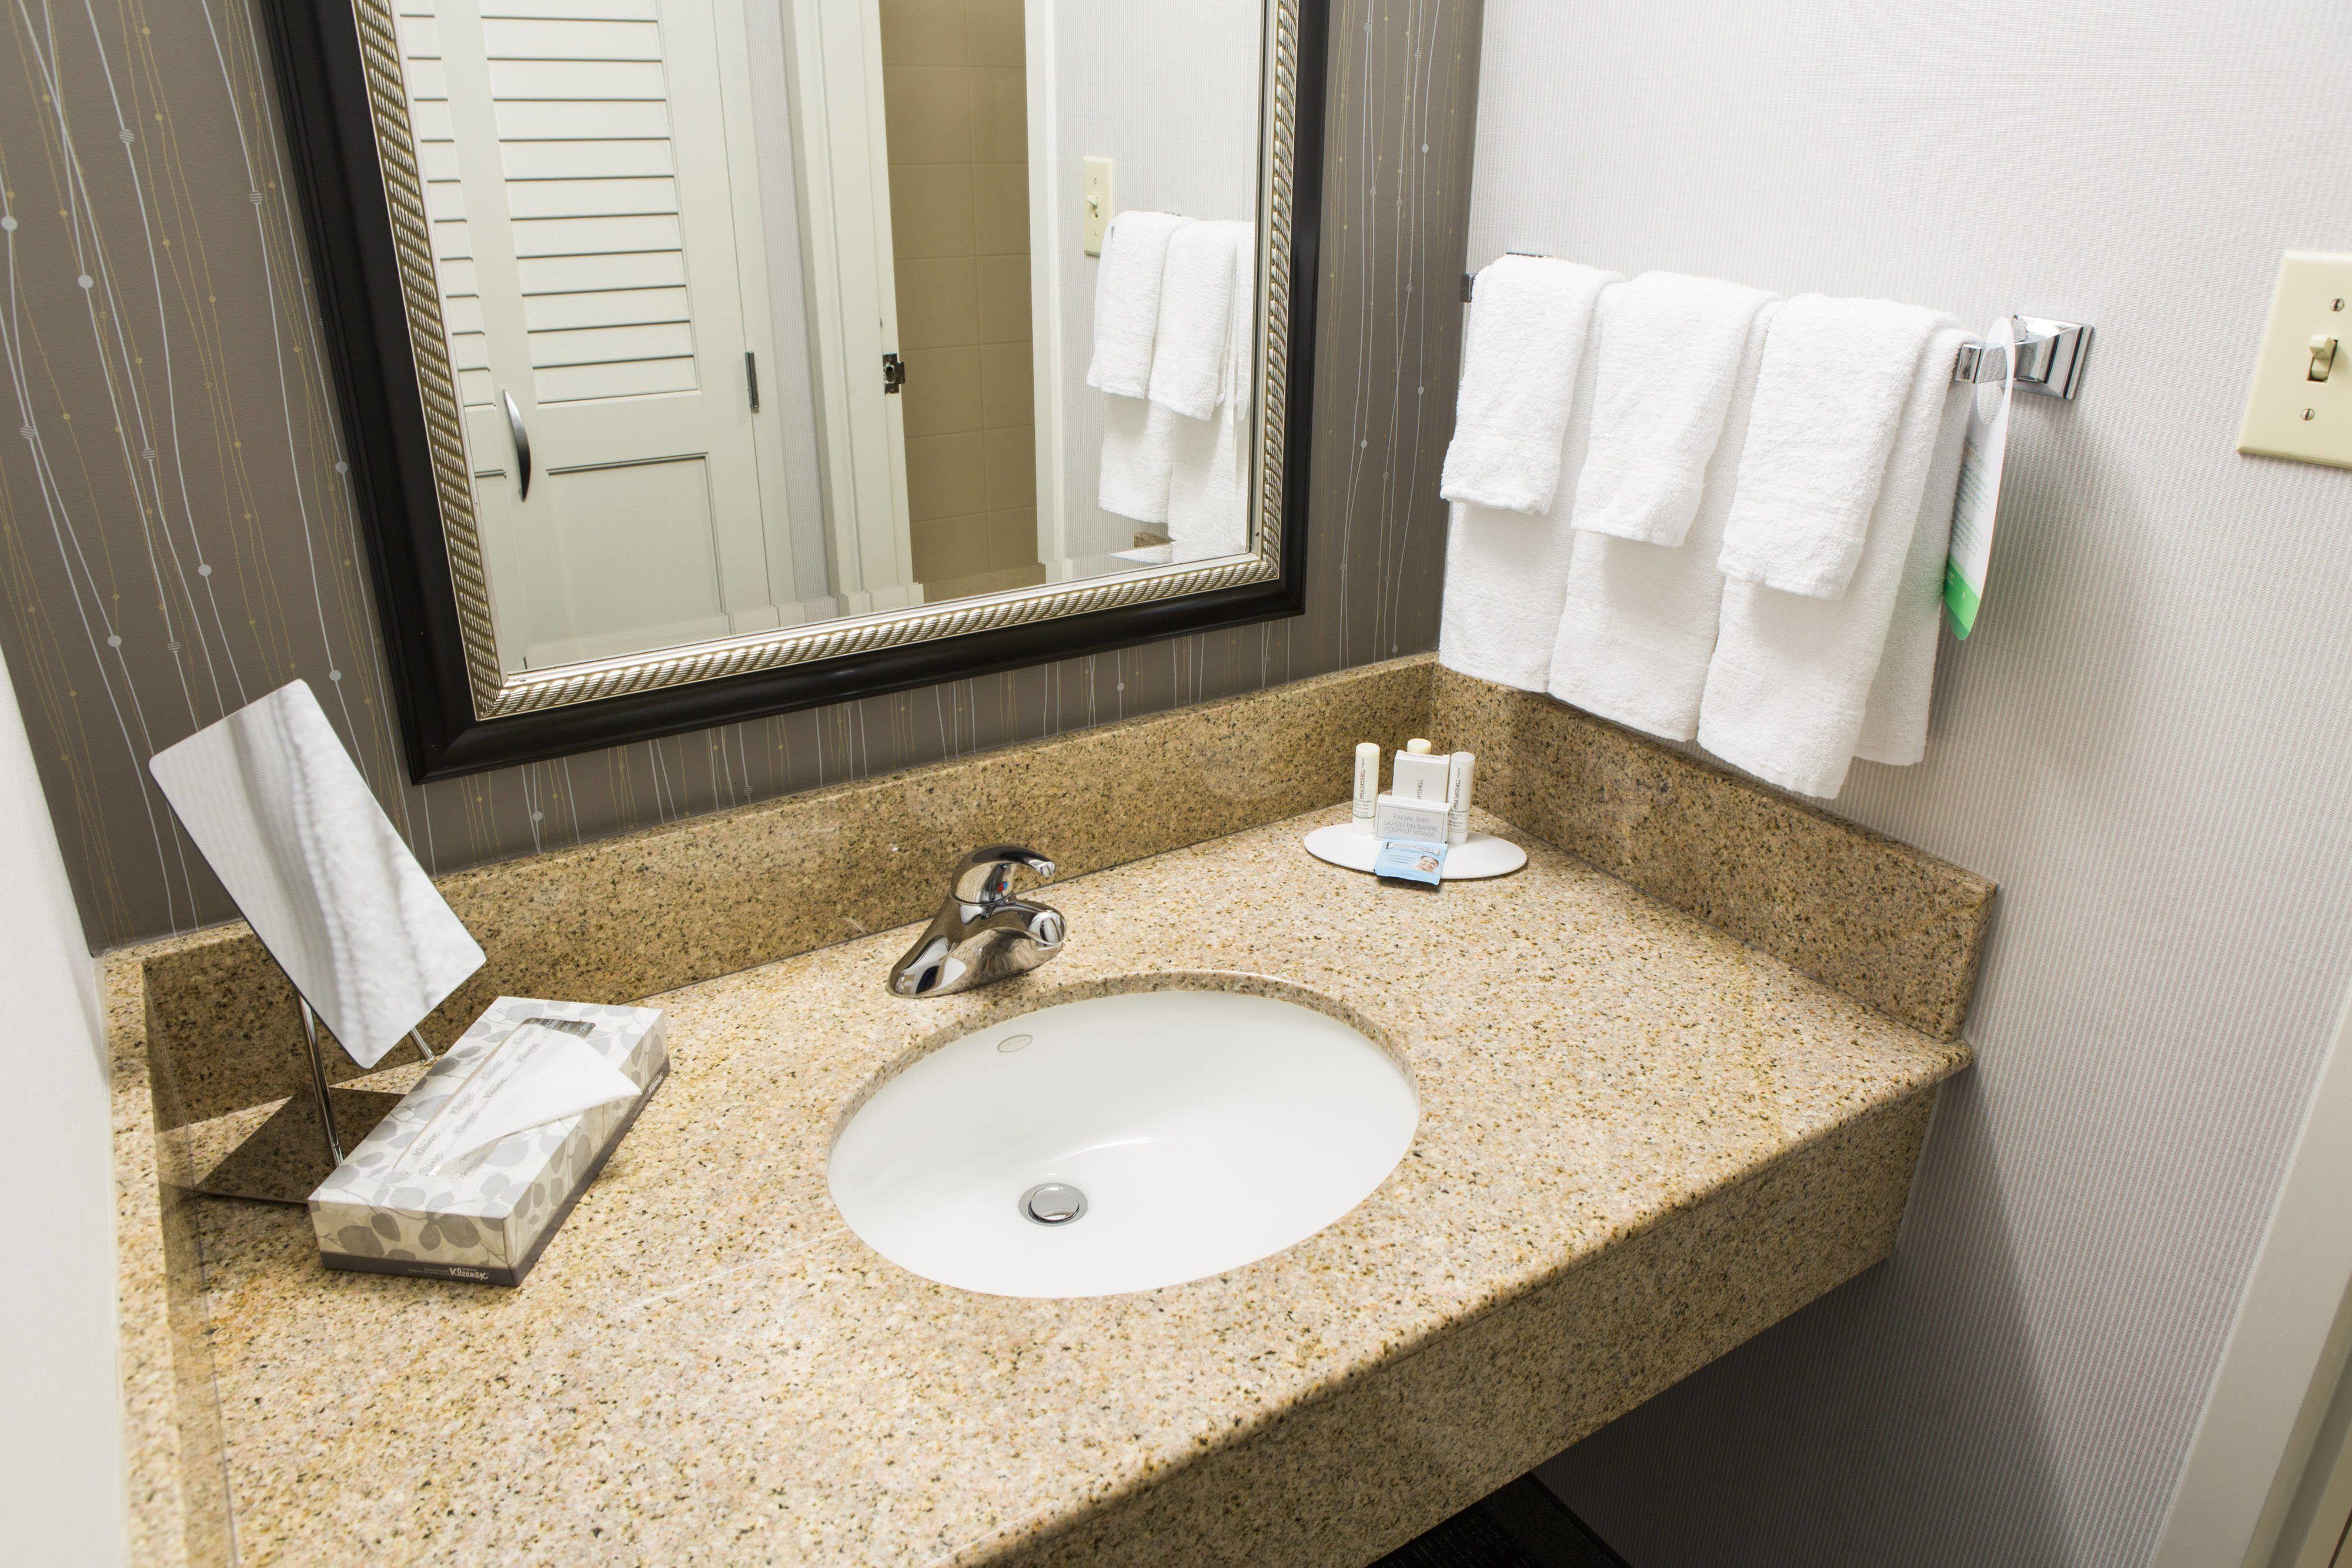 Courtyard Montgomery Guest Bathroom Vanity Hotels Travel Beautiful Guest Bathroom Framed Bathroom Mirror